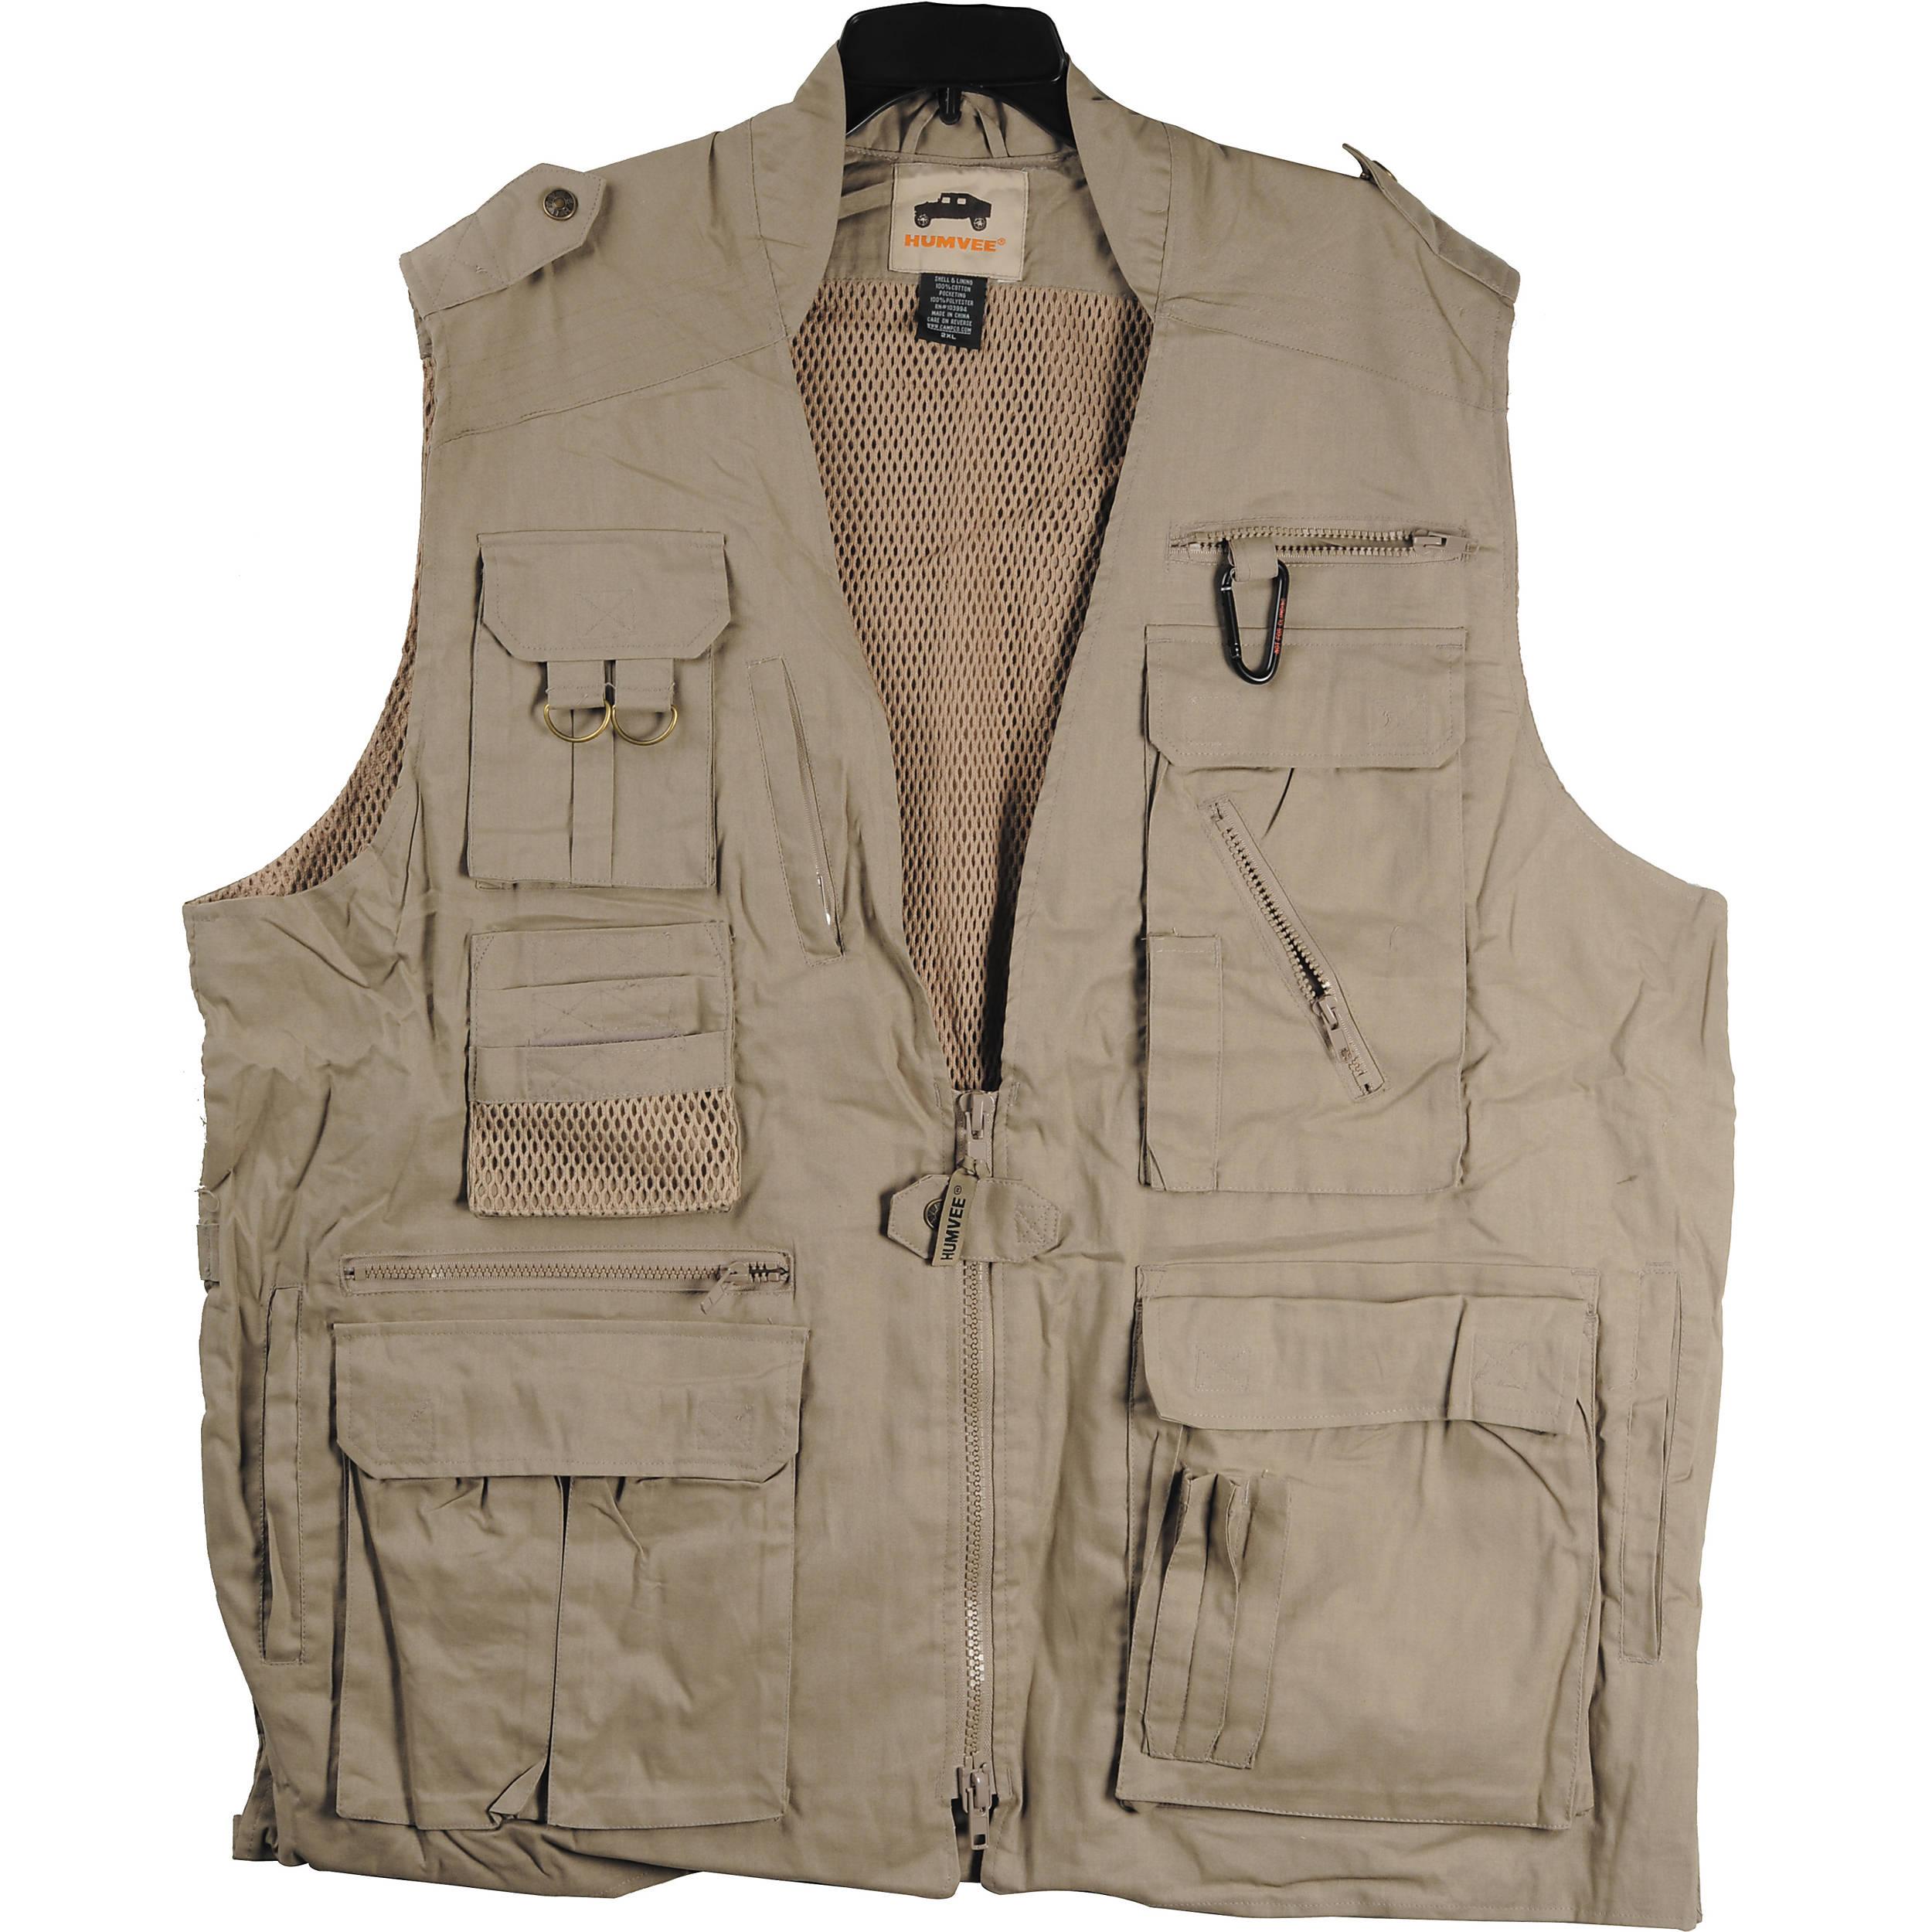 Humvee by campco safari photo vest medium khaki hmv vs k m for Best shirt to wear under ballistic vest